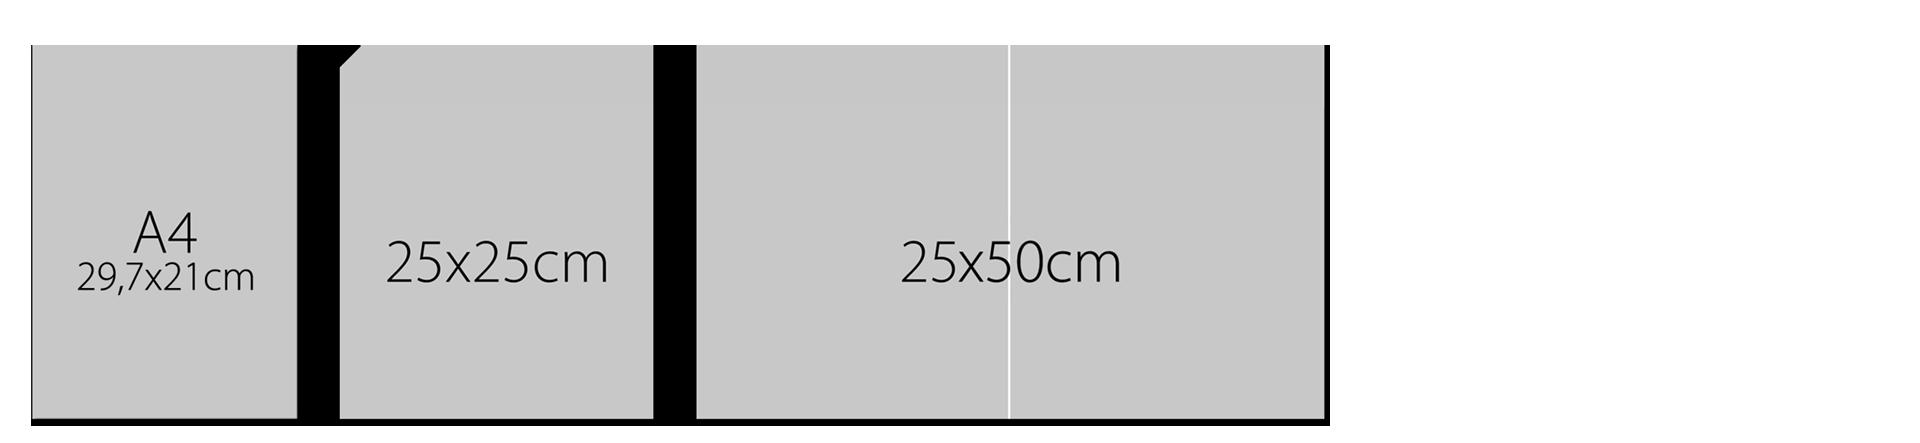 25x25